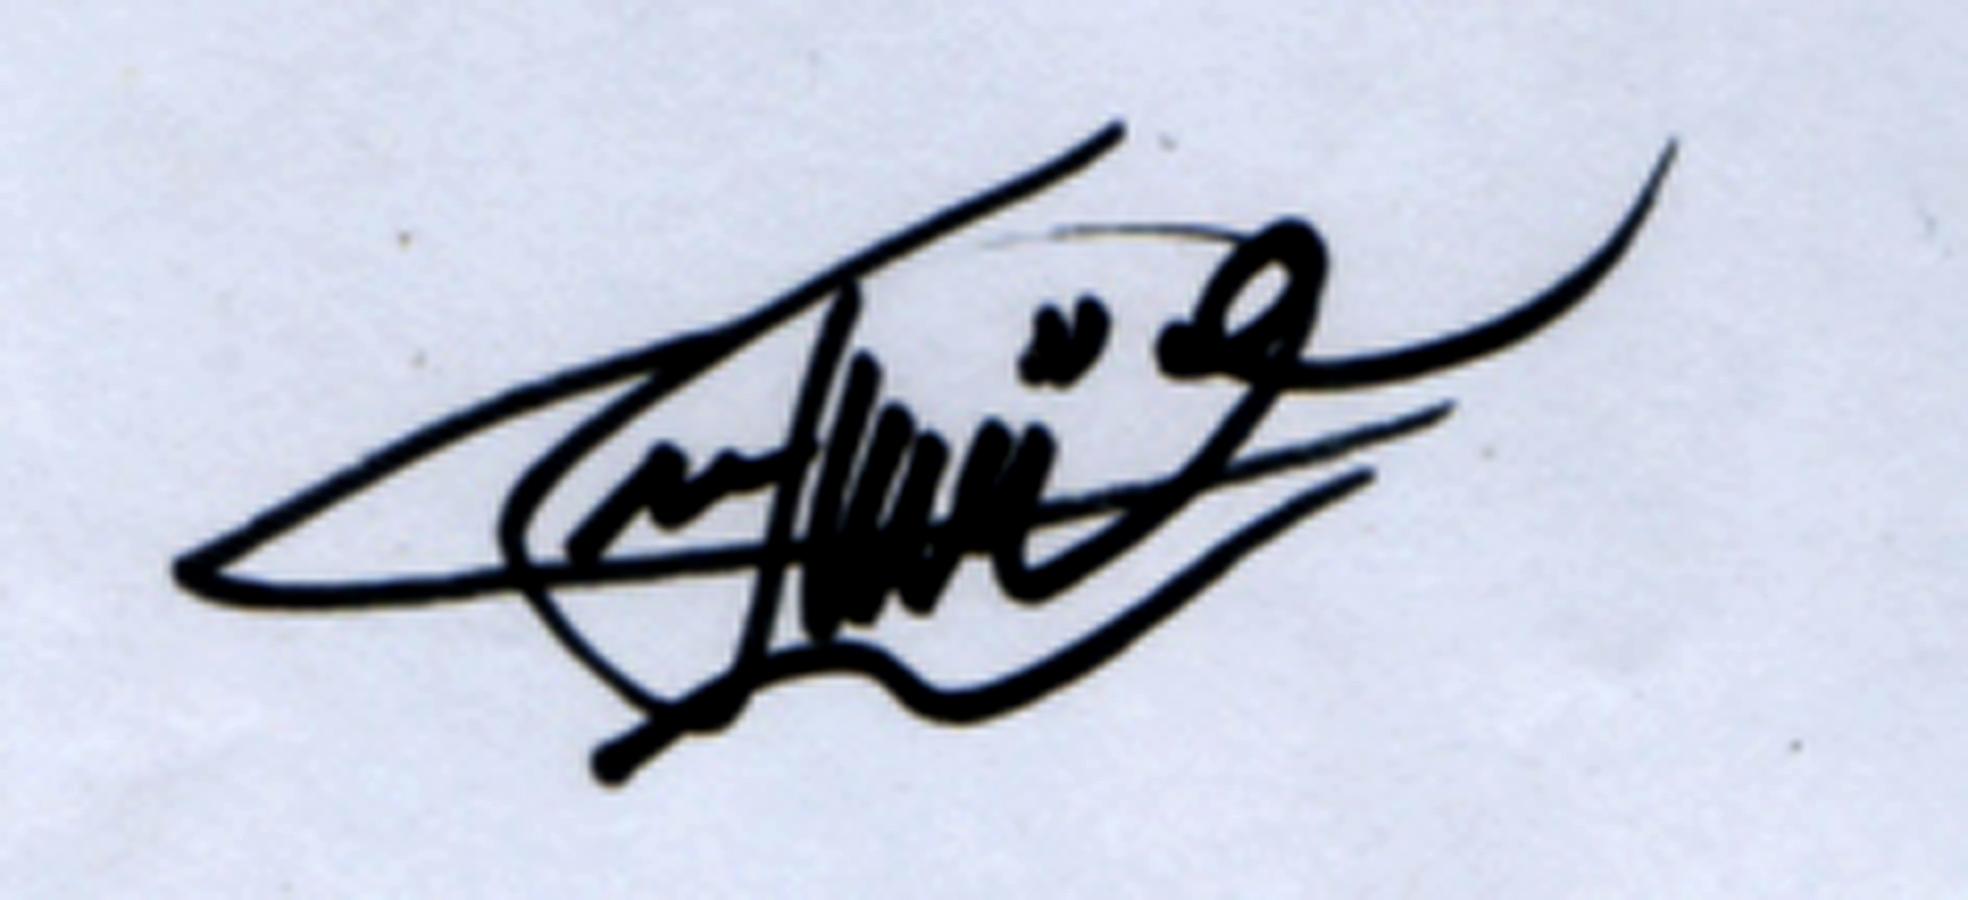 meitika lantiva's Signature